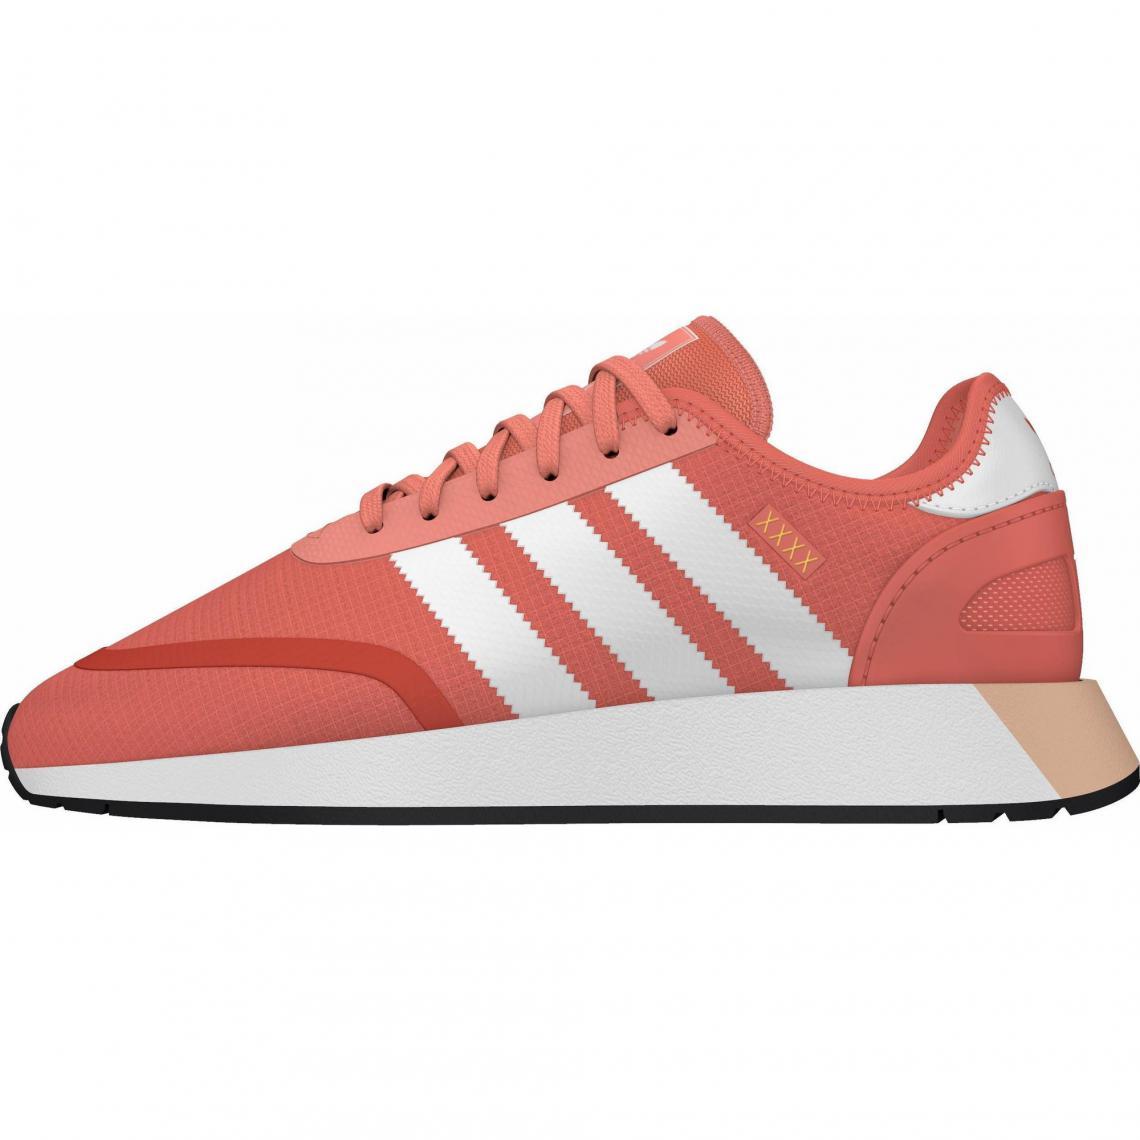 Sombre Chaussures De 5923 N Femme Originals Adidas Rose Sport gUq1Txf